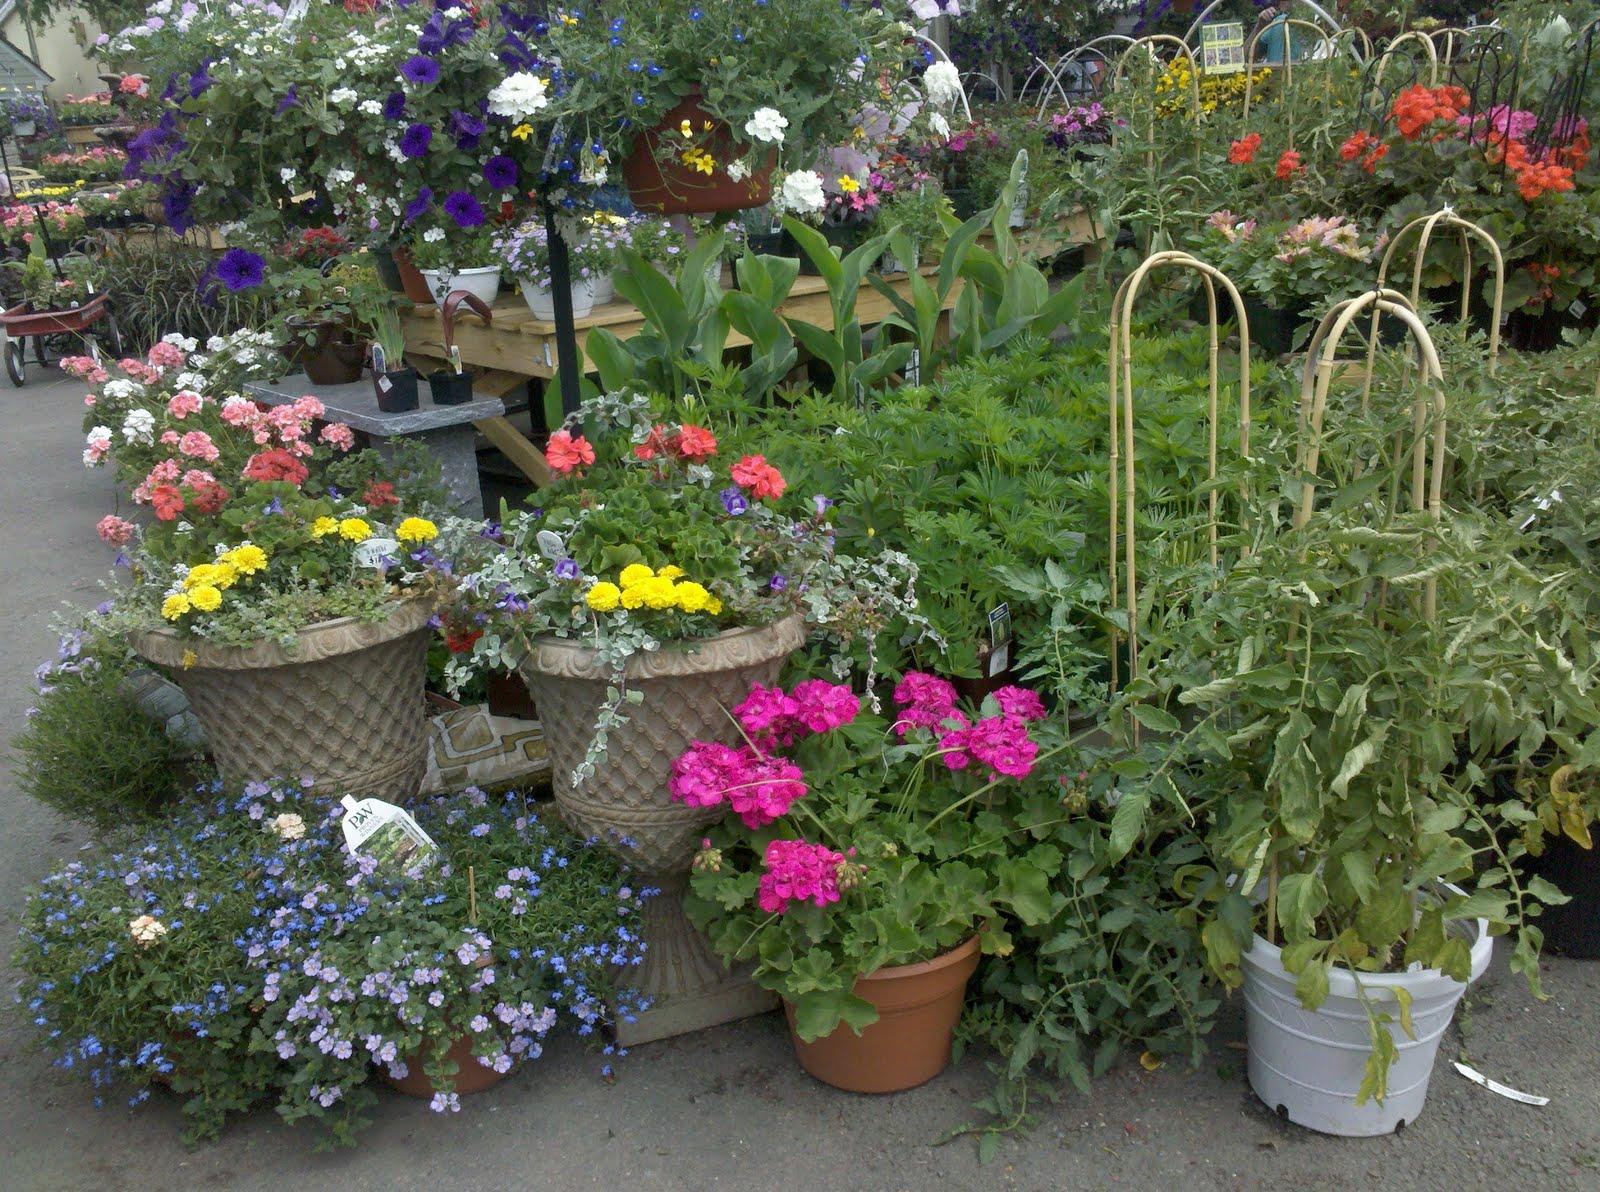 Twigs and scraps ideas for nesting merrifield garden for Idea center dilshad garden